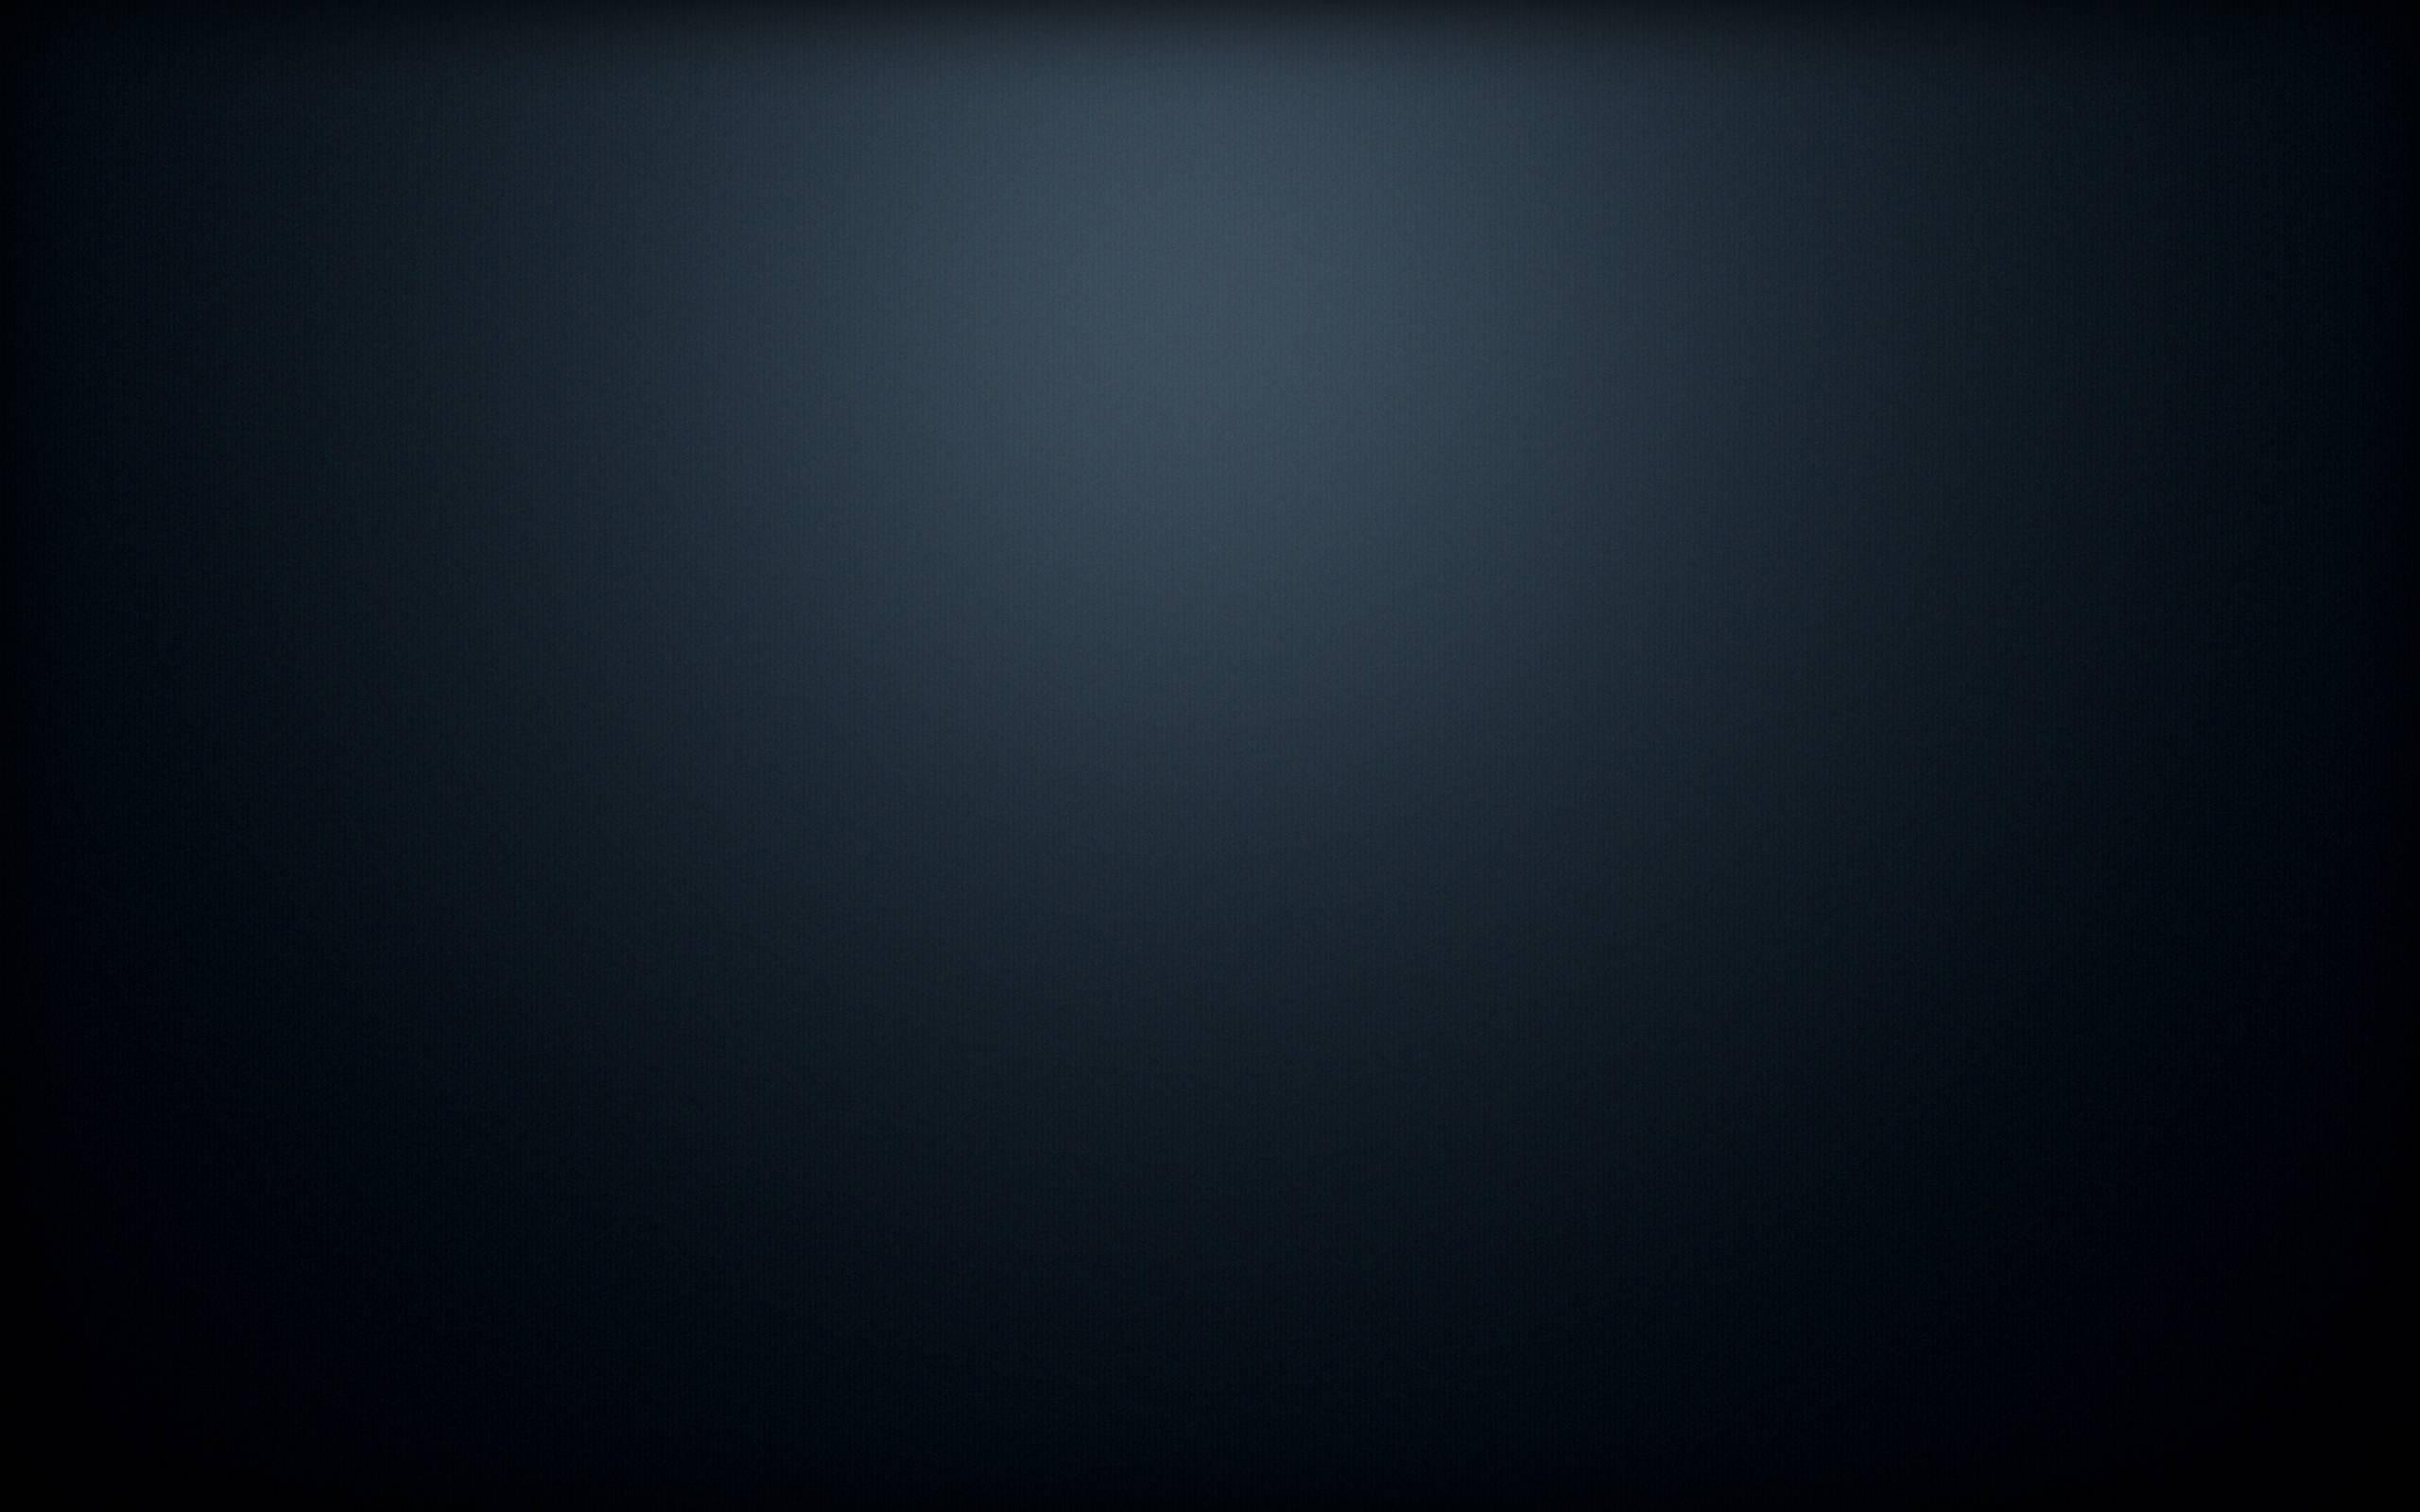 Dark Blue Wallpapers Wallpaper Cave HD Wallpapers Download Free Images Wallpaper [1000image.com]